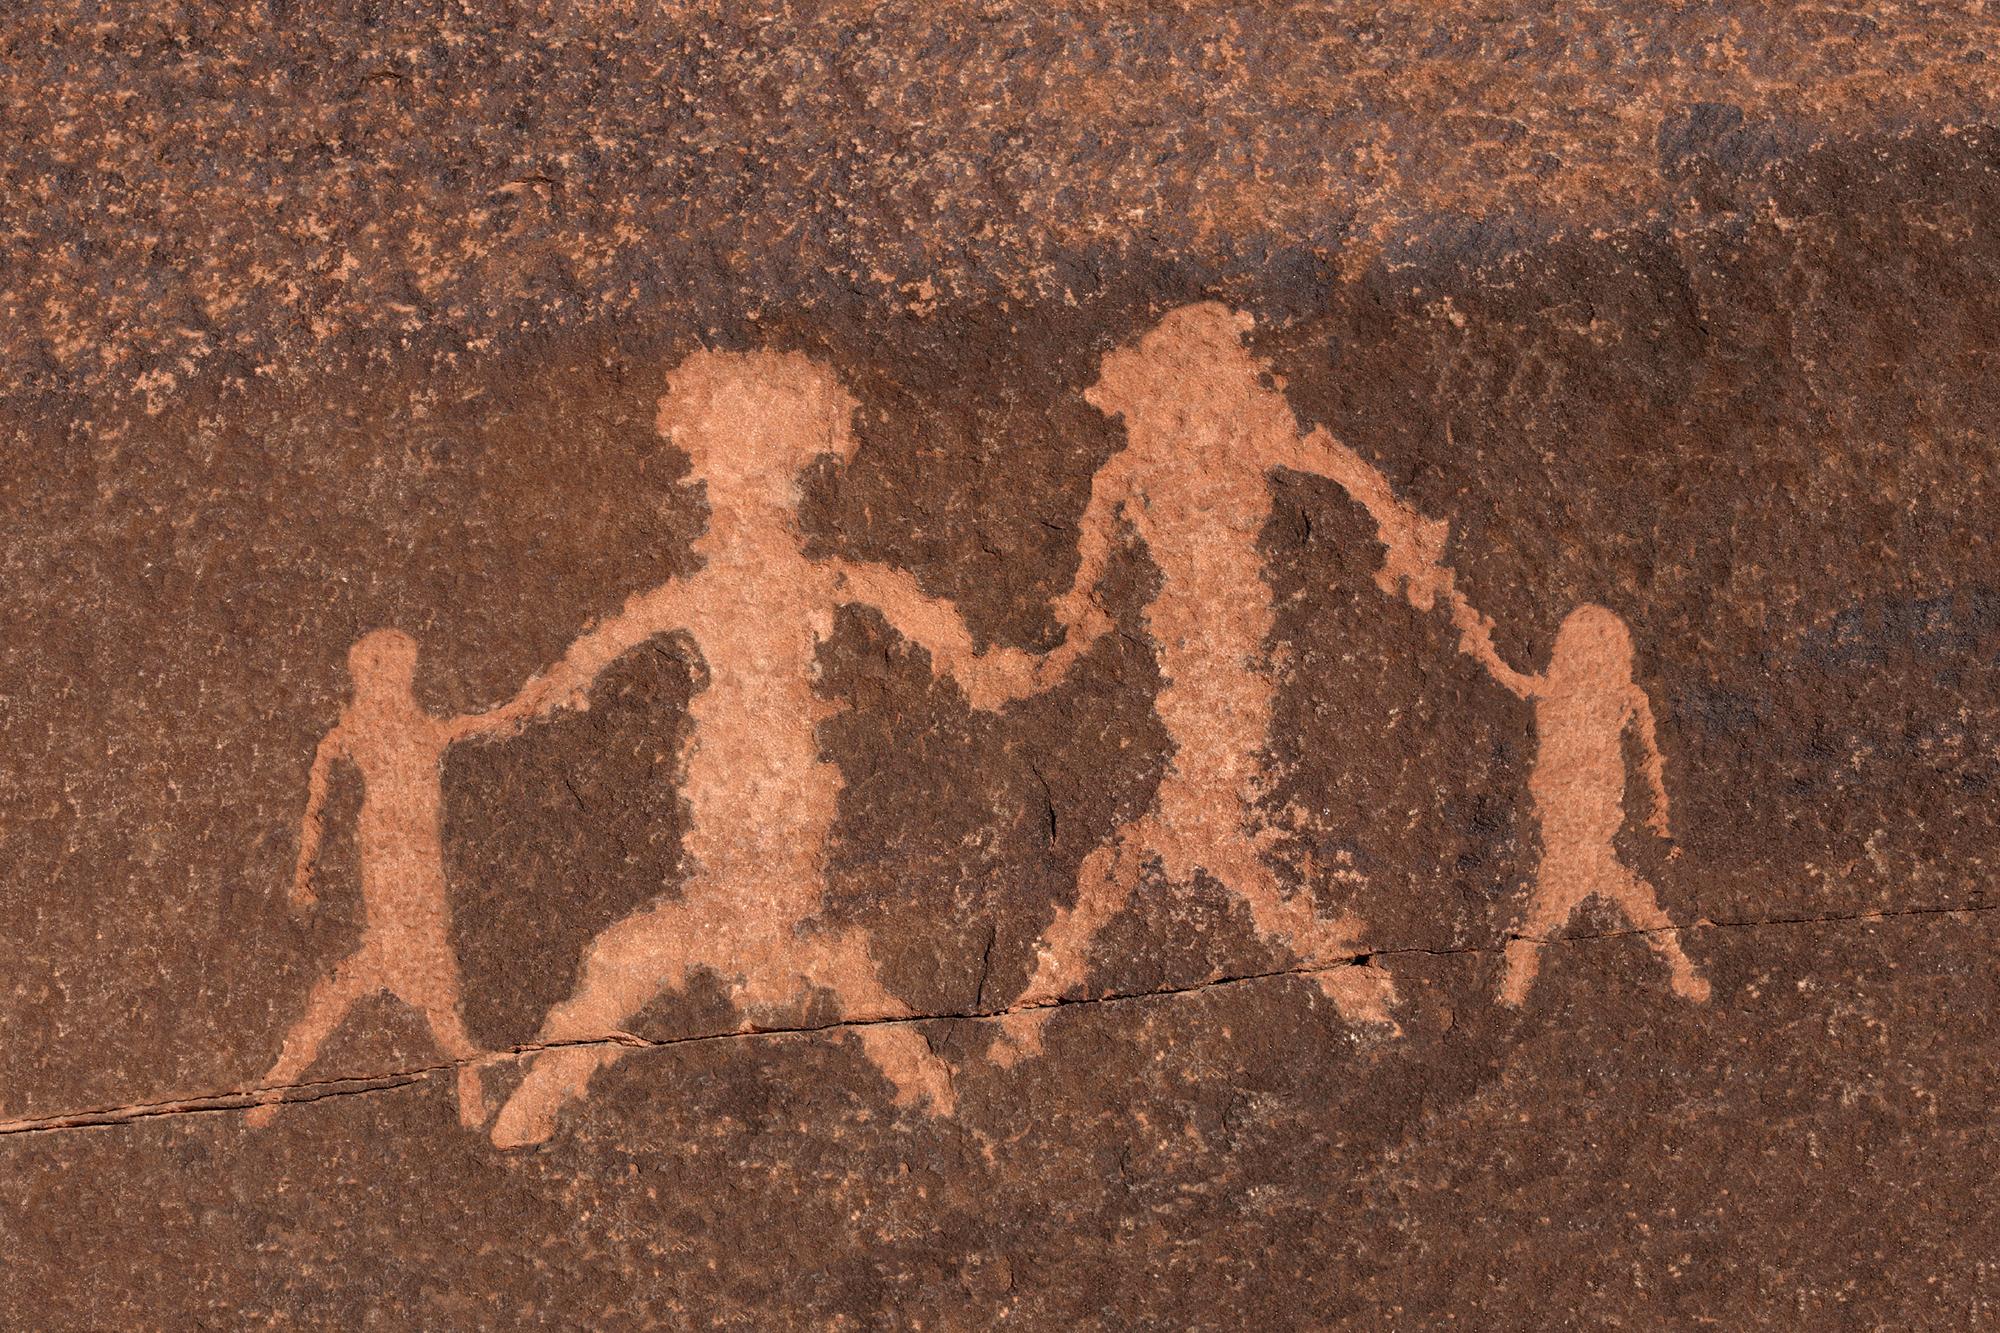 Petroglyph family